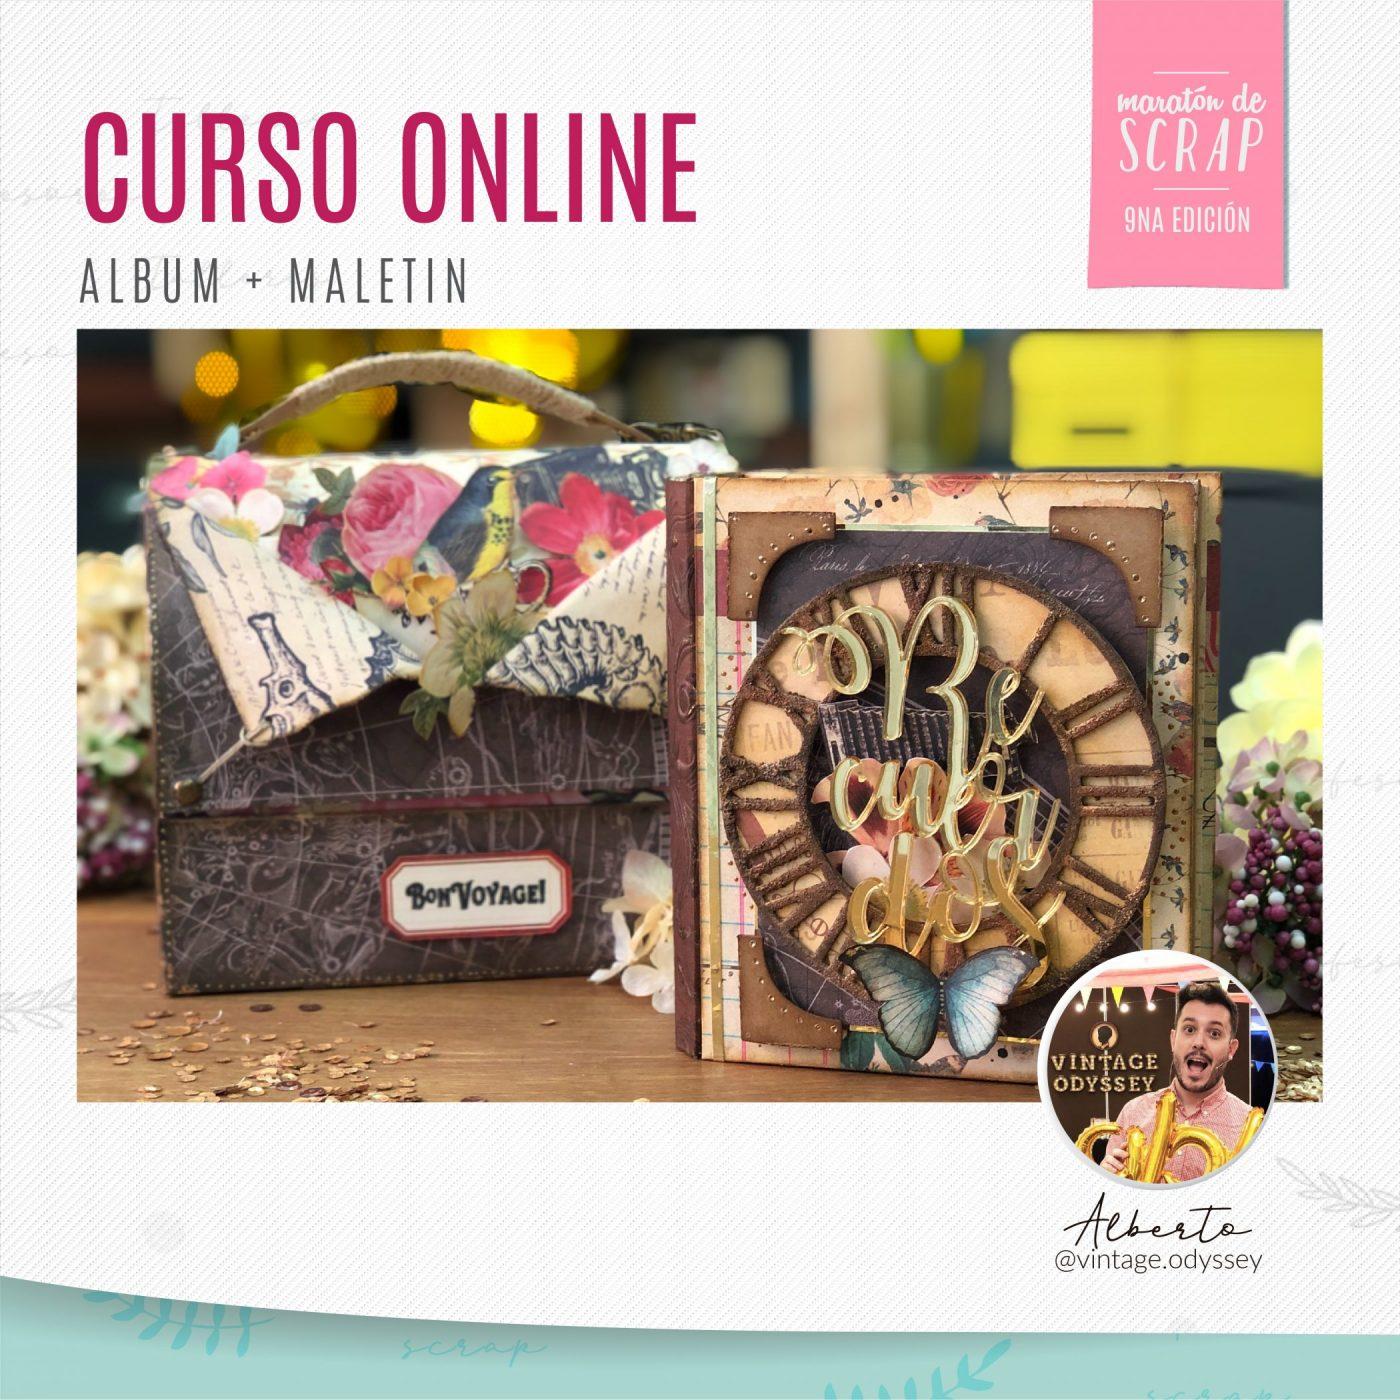 Curso online: Album + Maletín